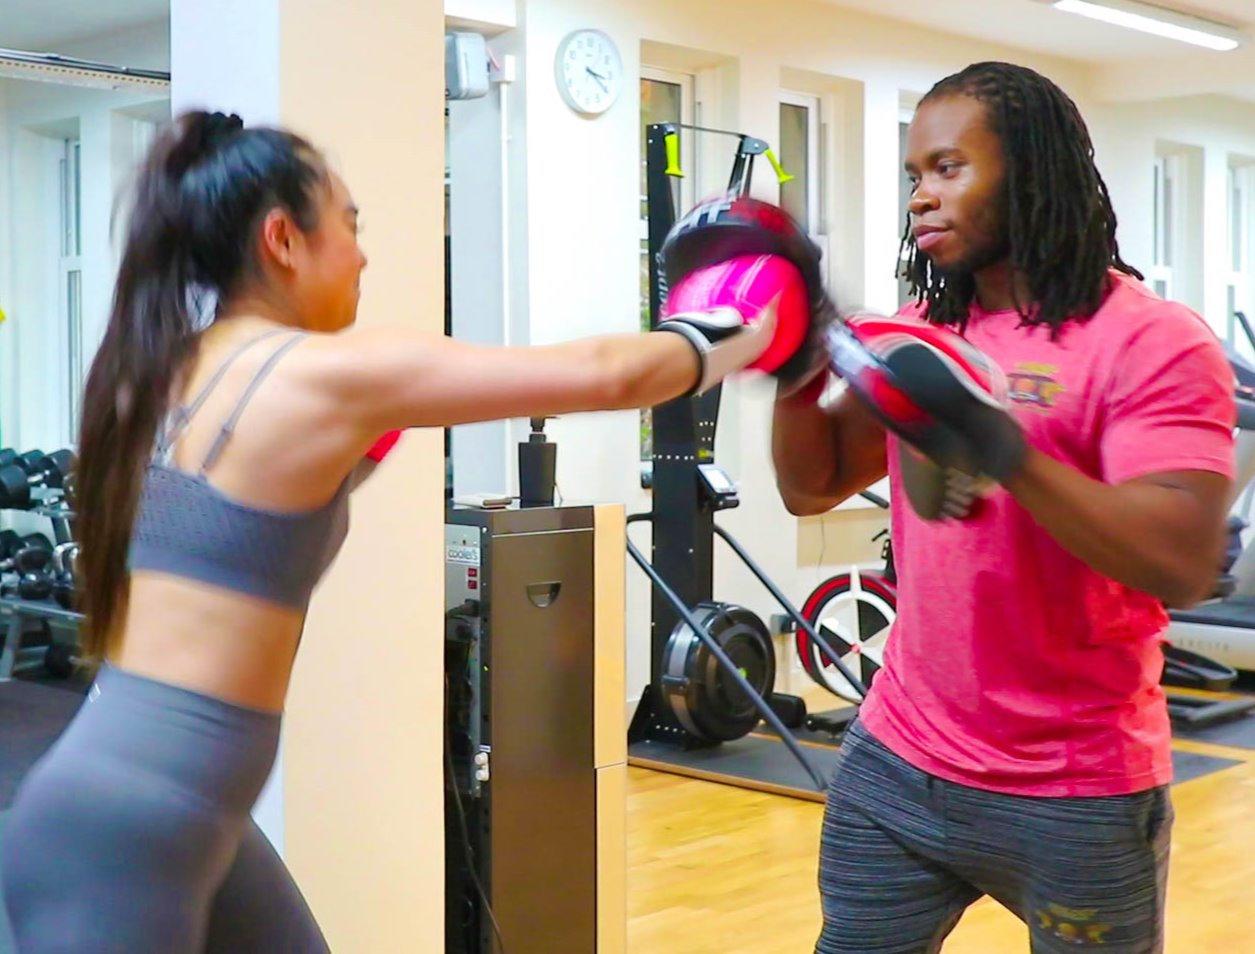 1-2-1 Boxing Training